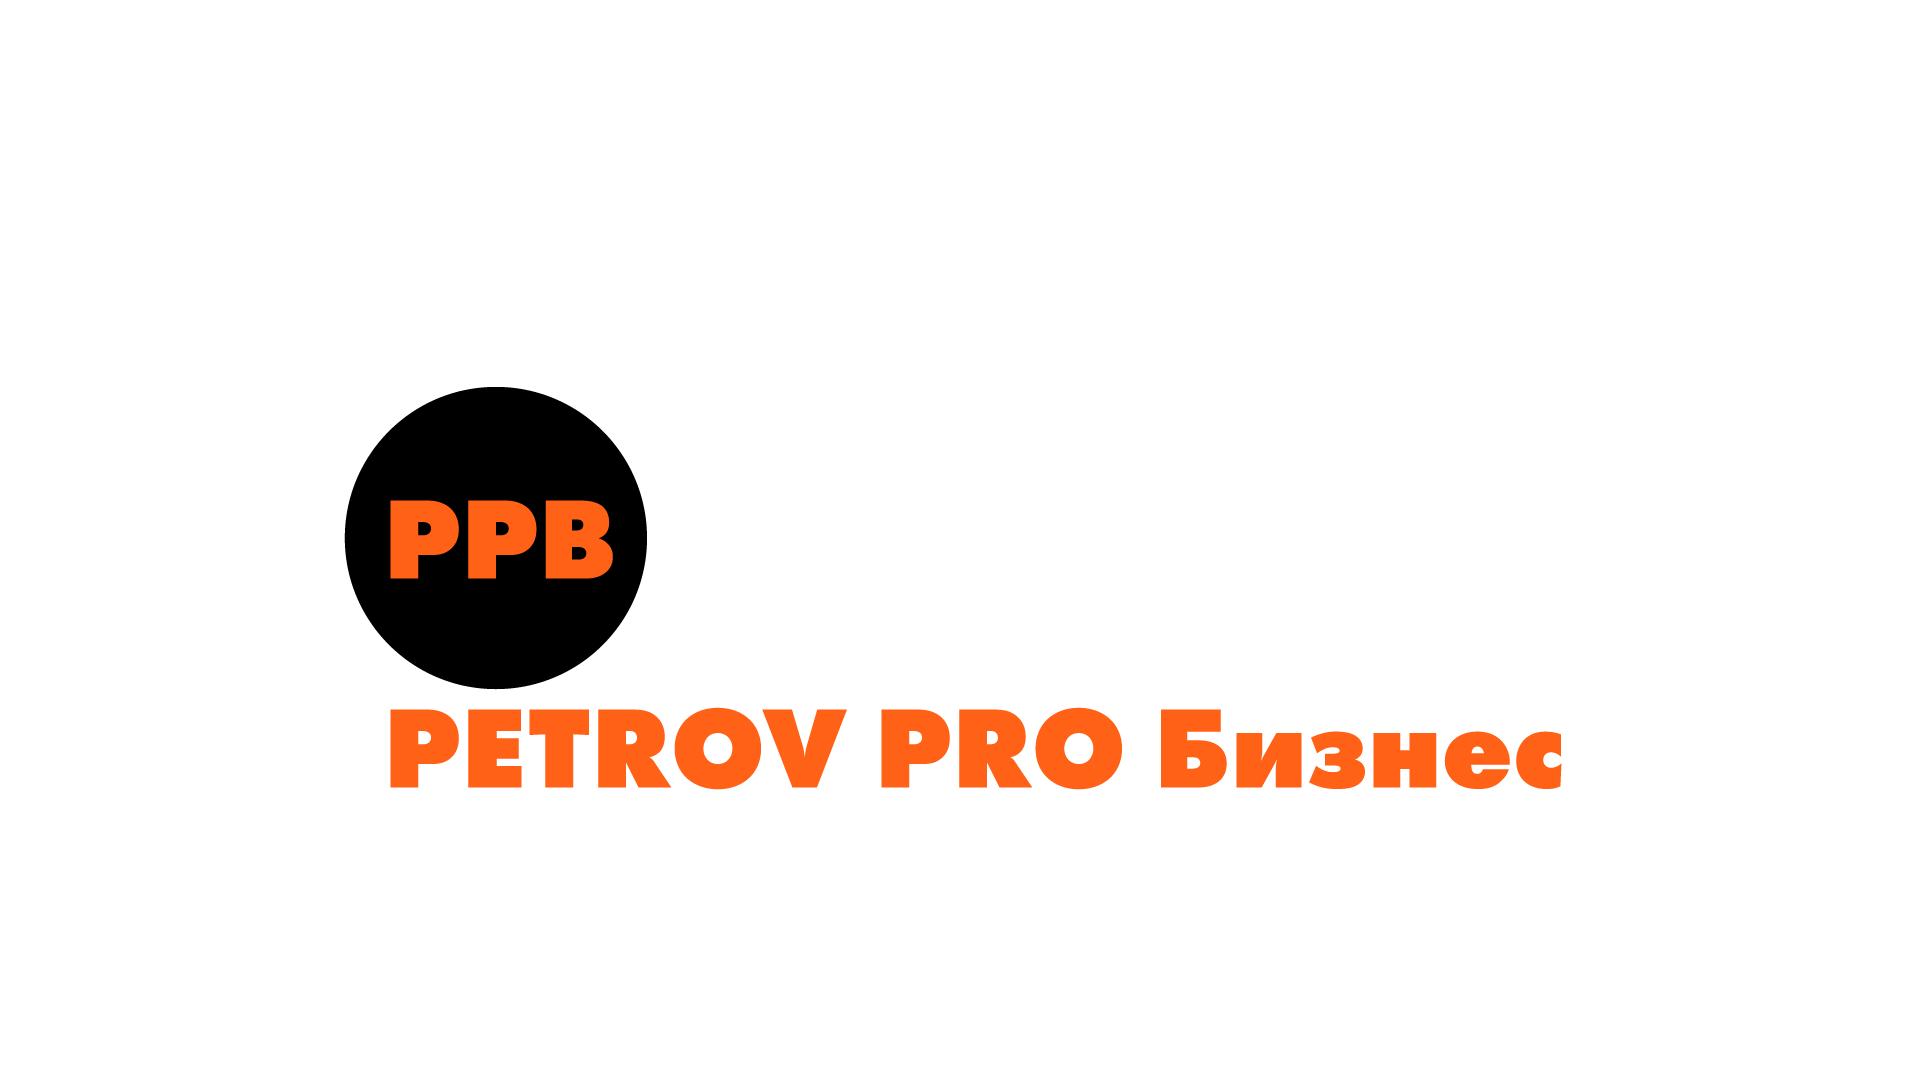 Создать логотип для YouTube канала  фото f_2225bfeea5121866.png